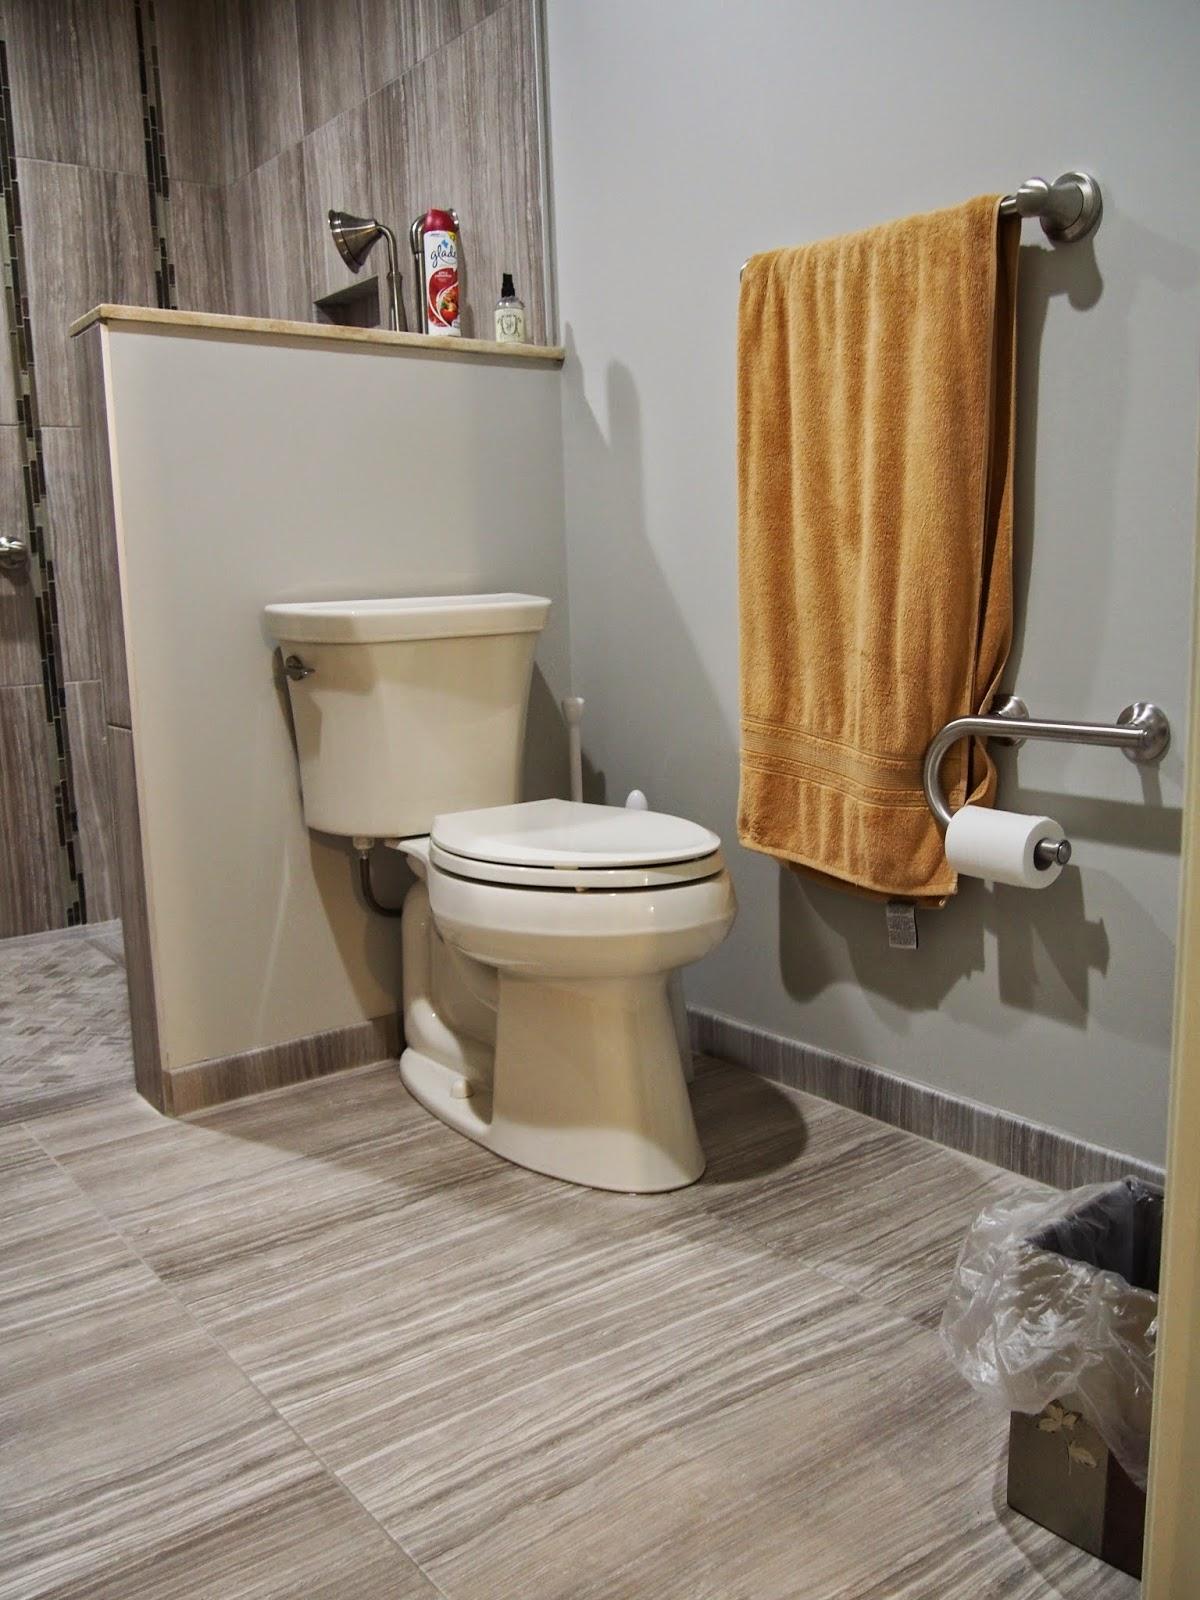 Blogspot toilet domination